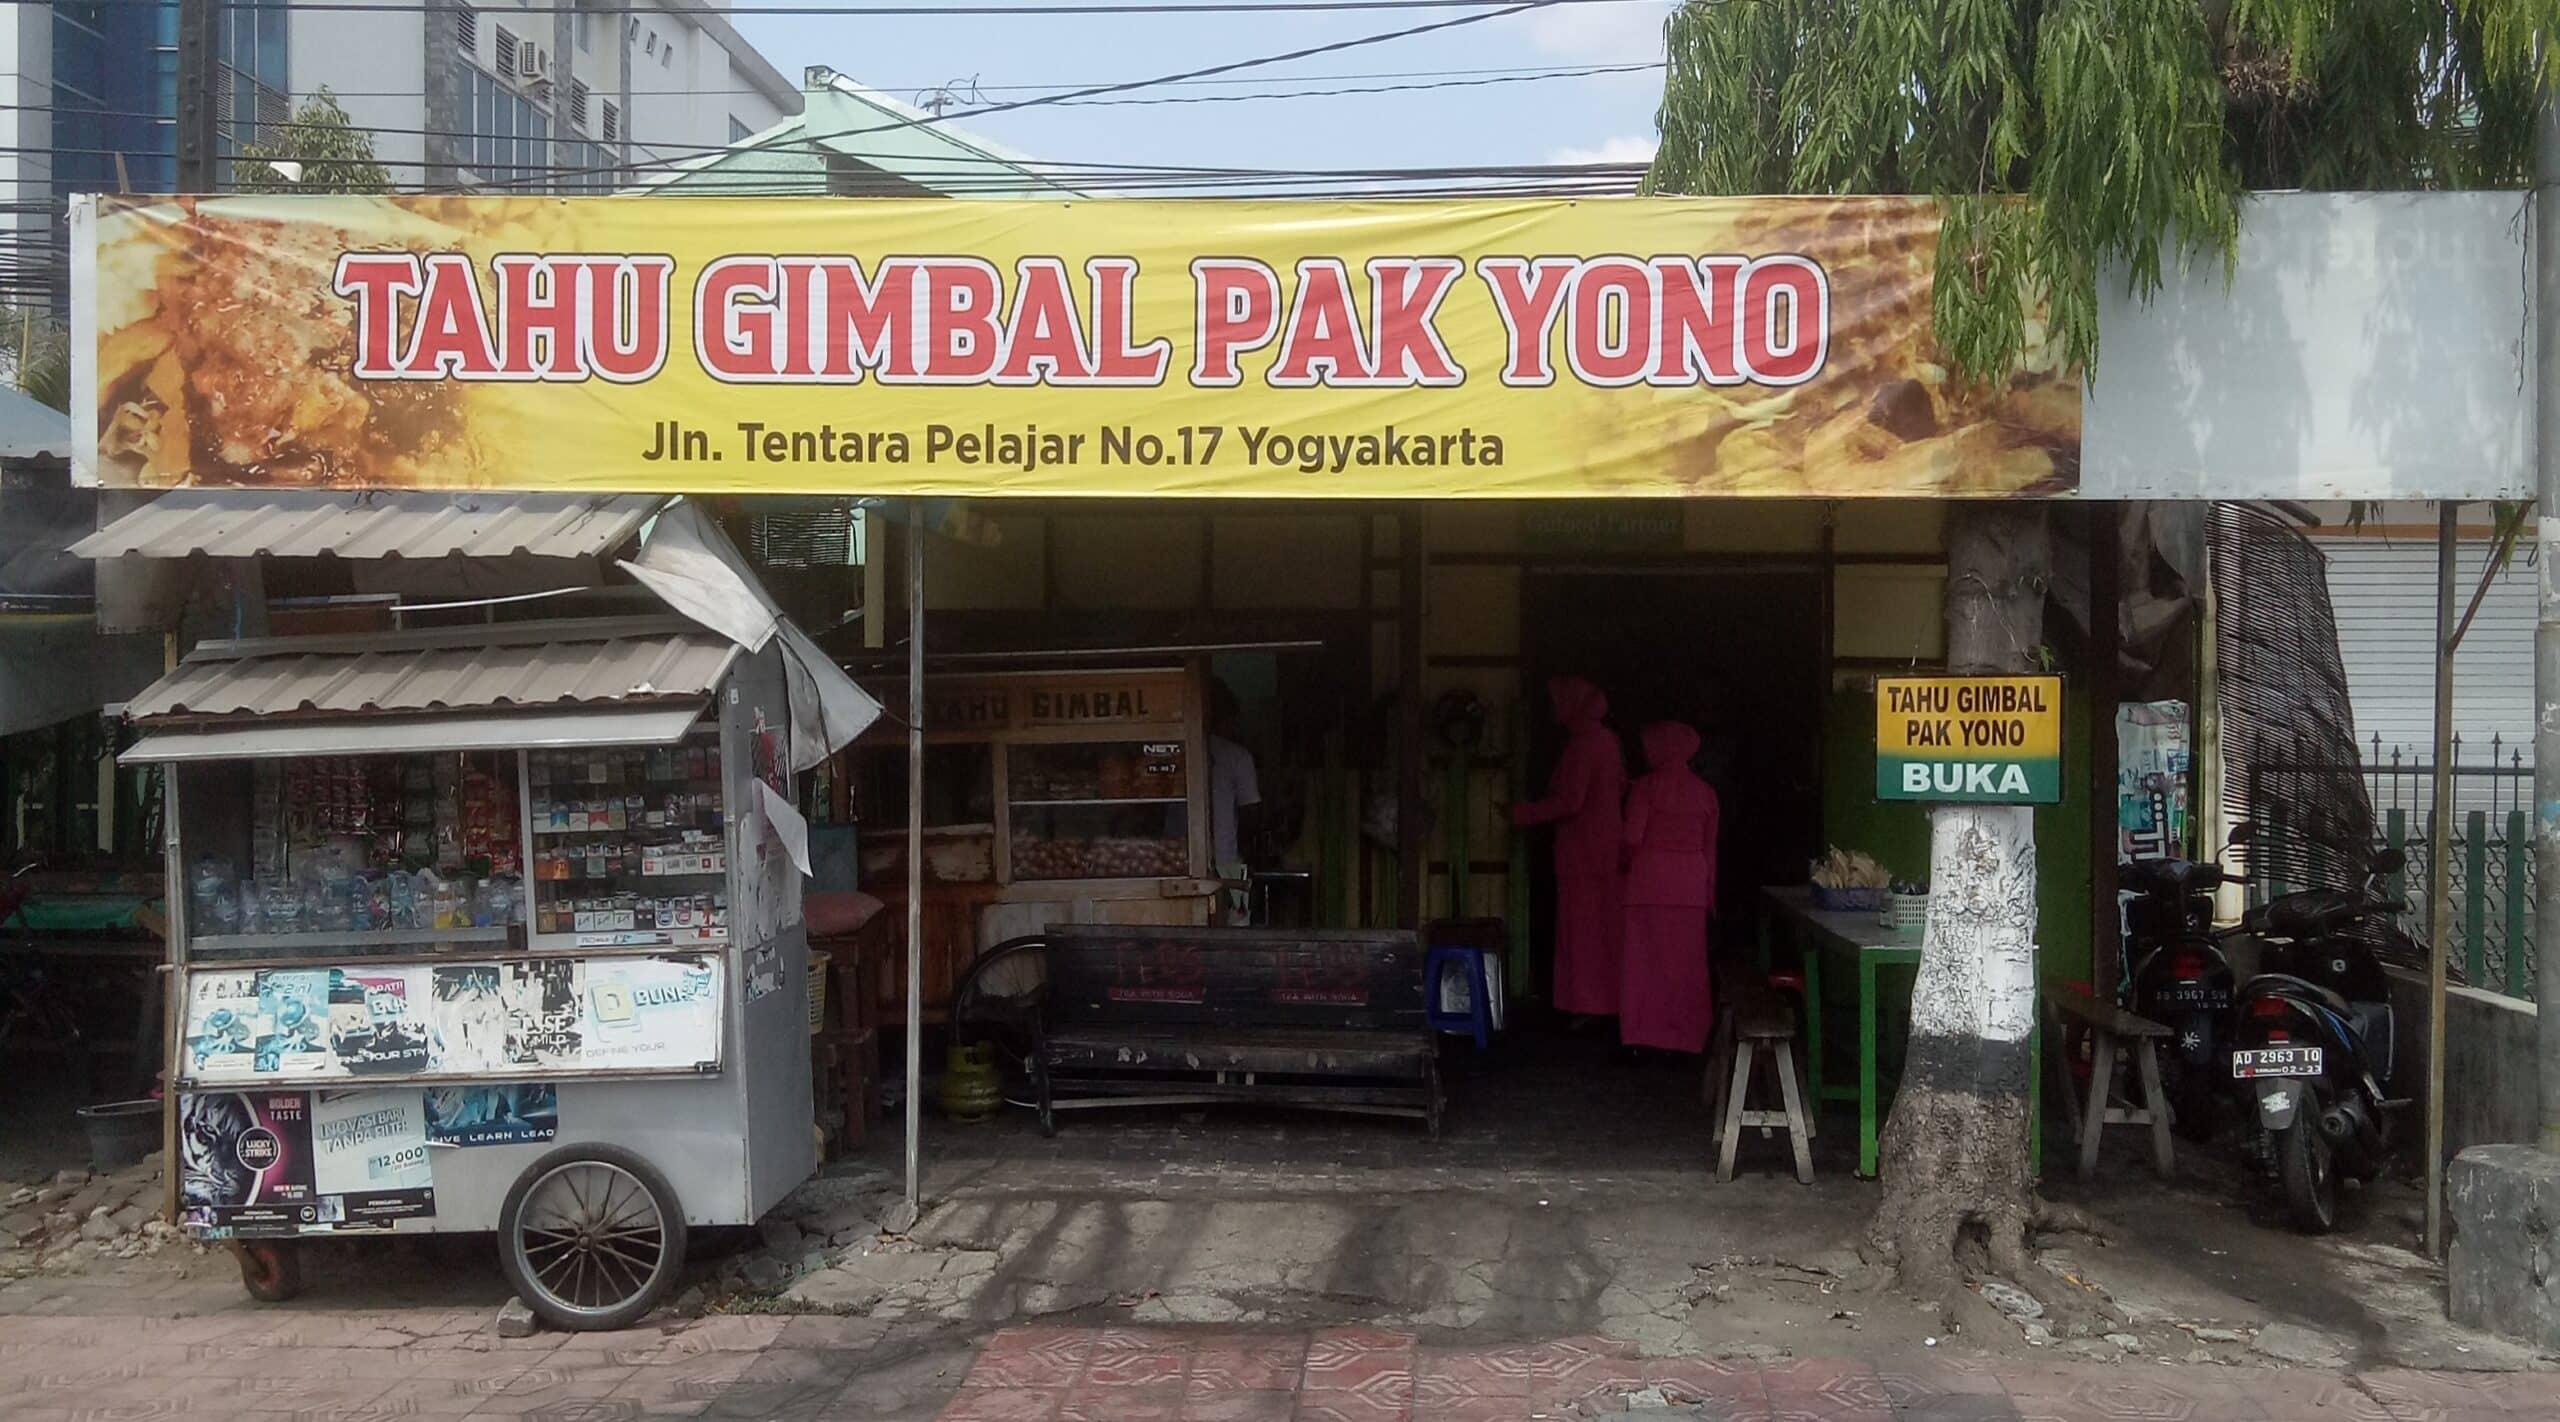 Gambar Tahu Gimbal Pak Yono